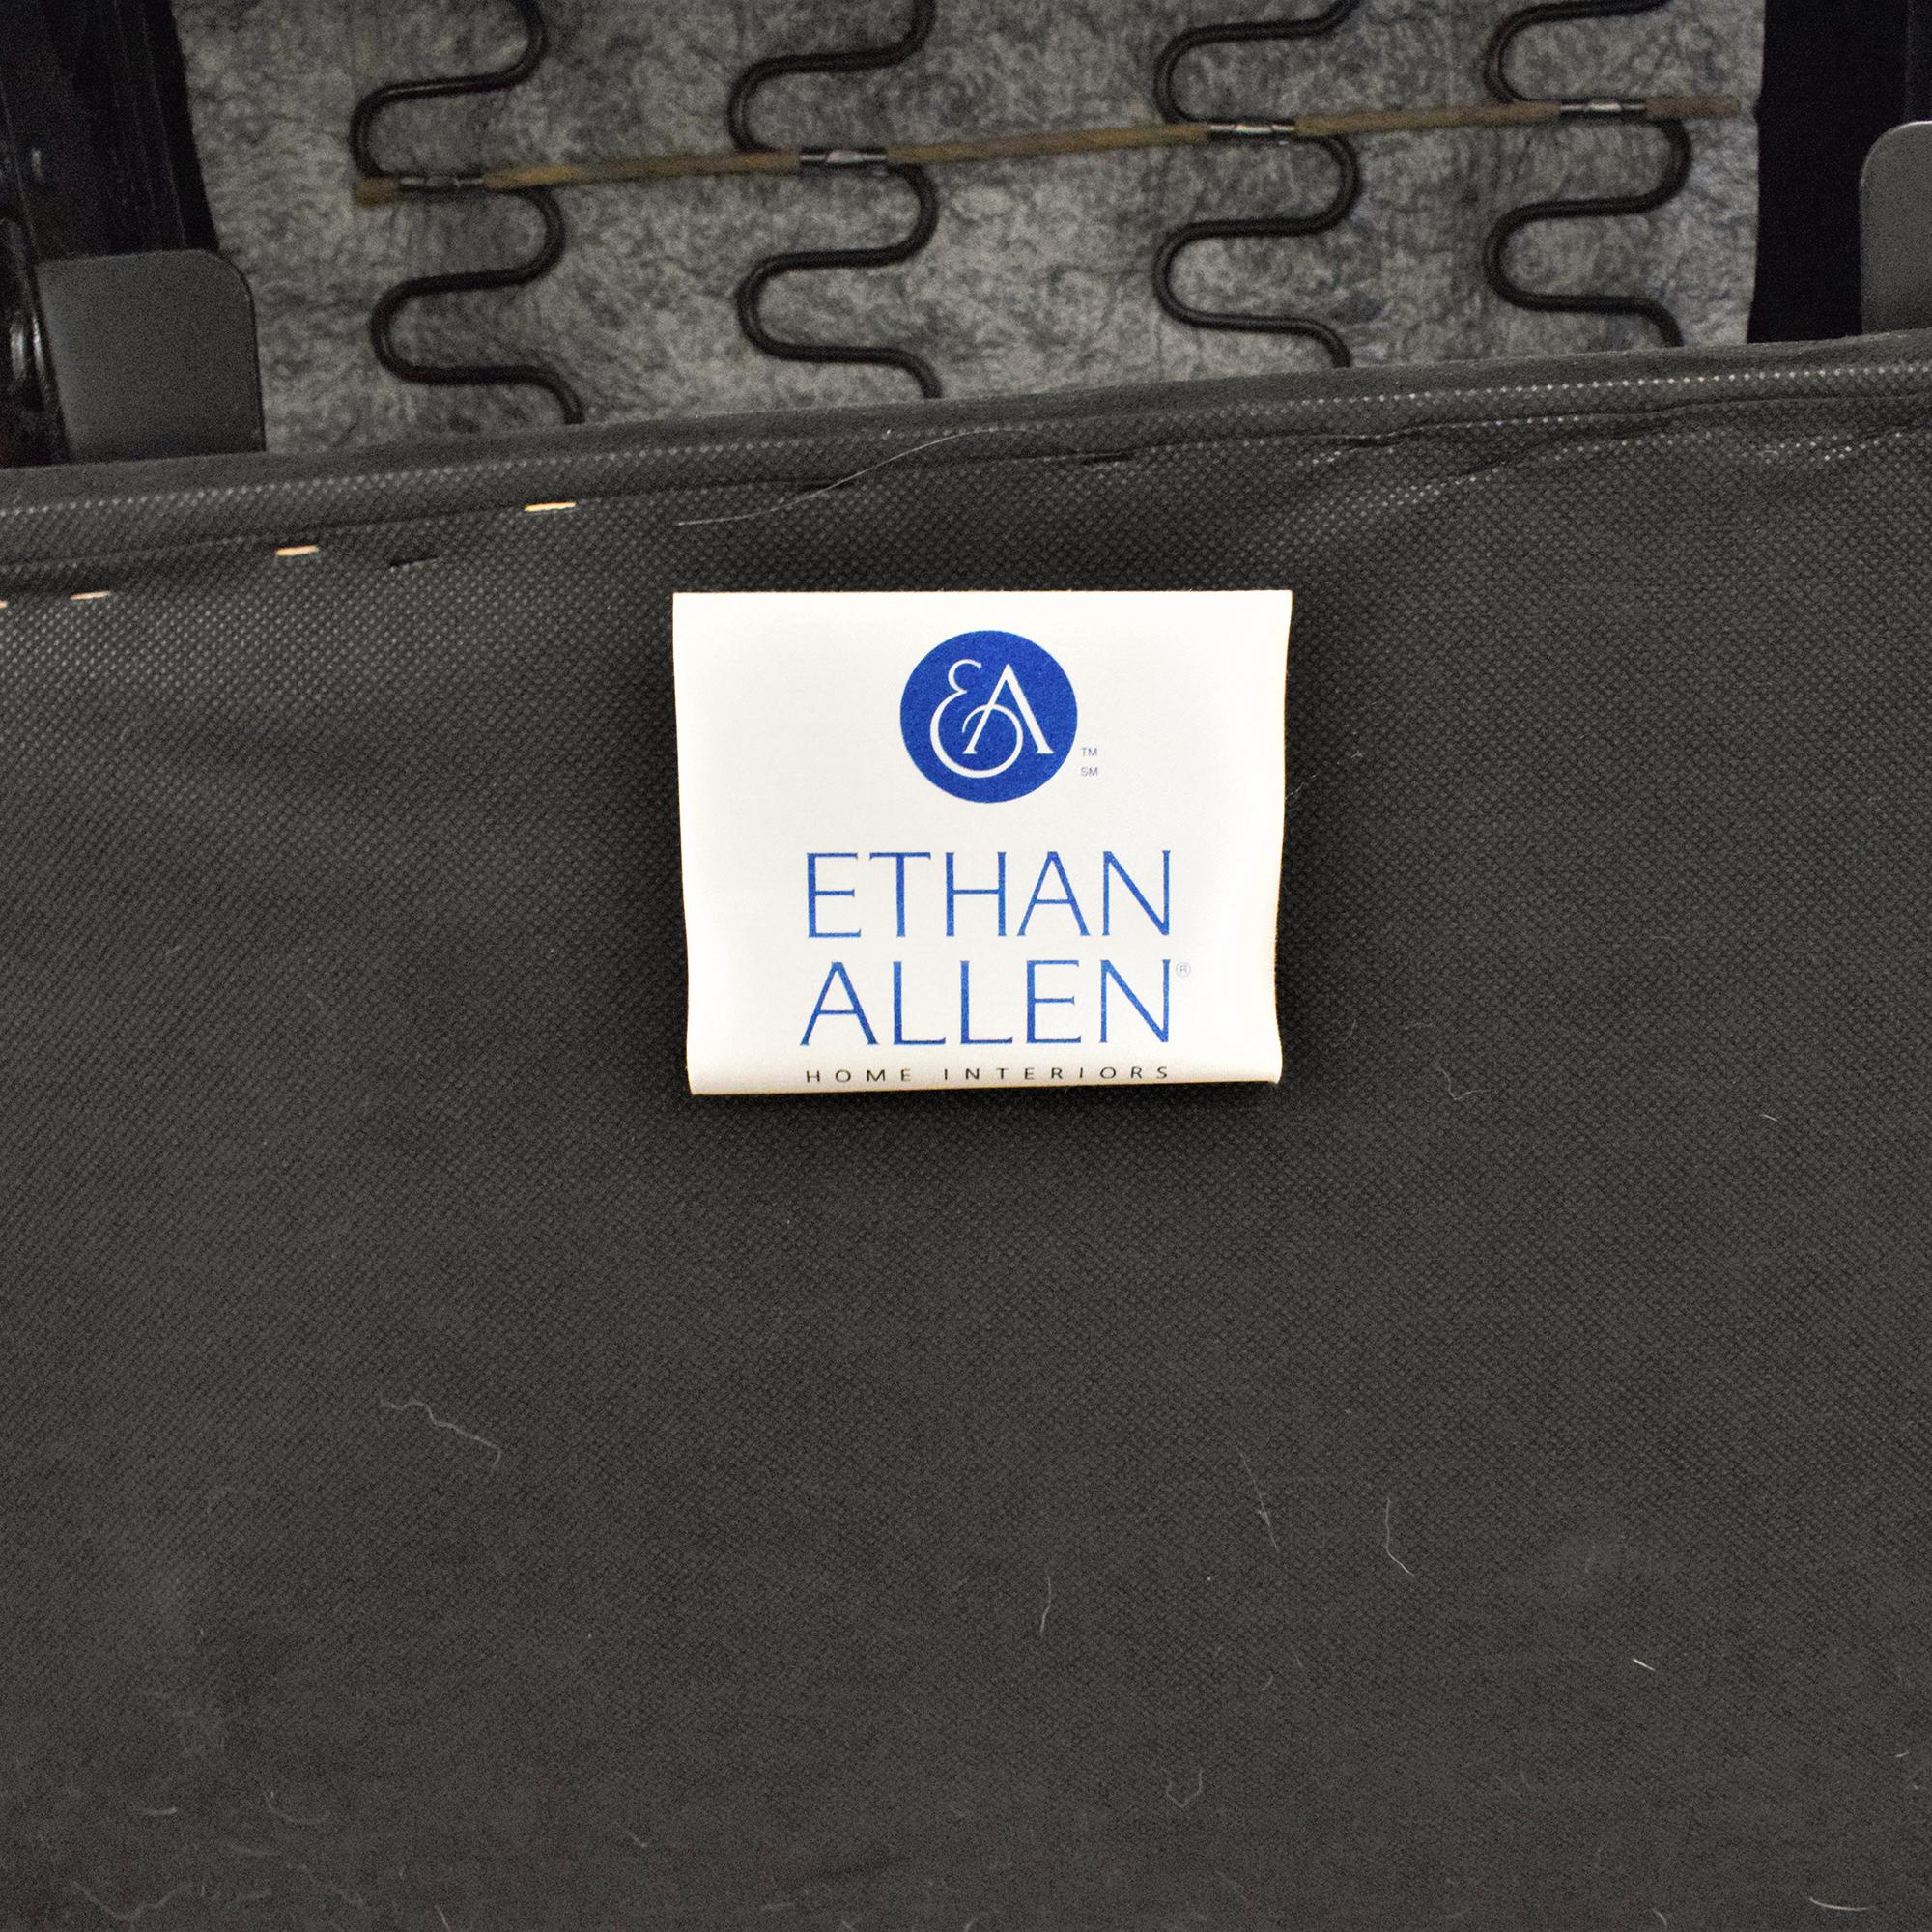 Ethan Allen Ethan Allen Roll Arm Recliner for sale